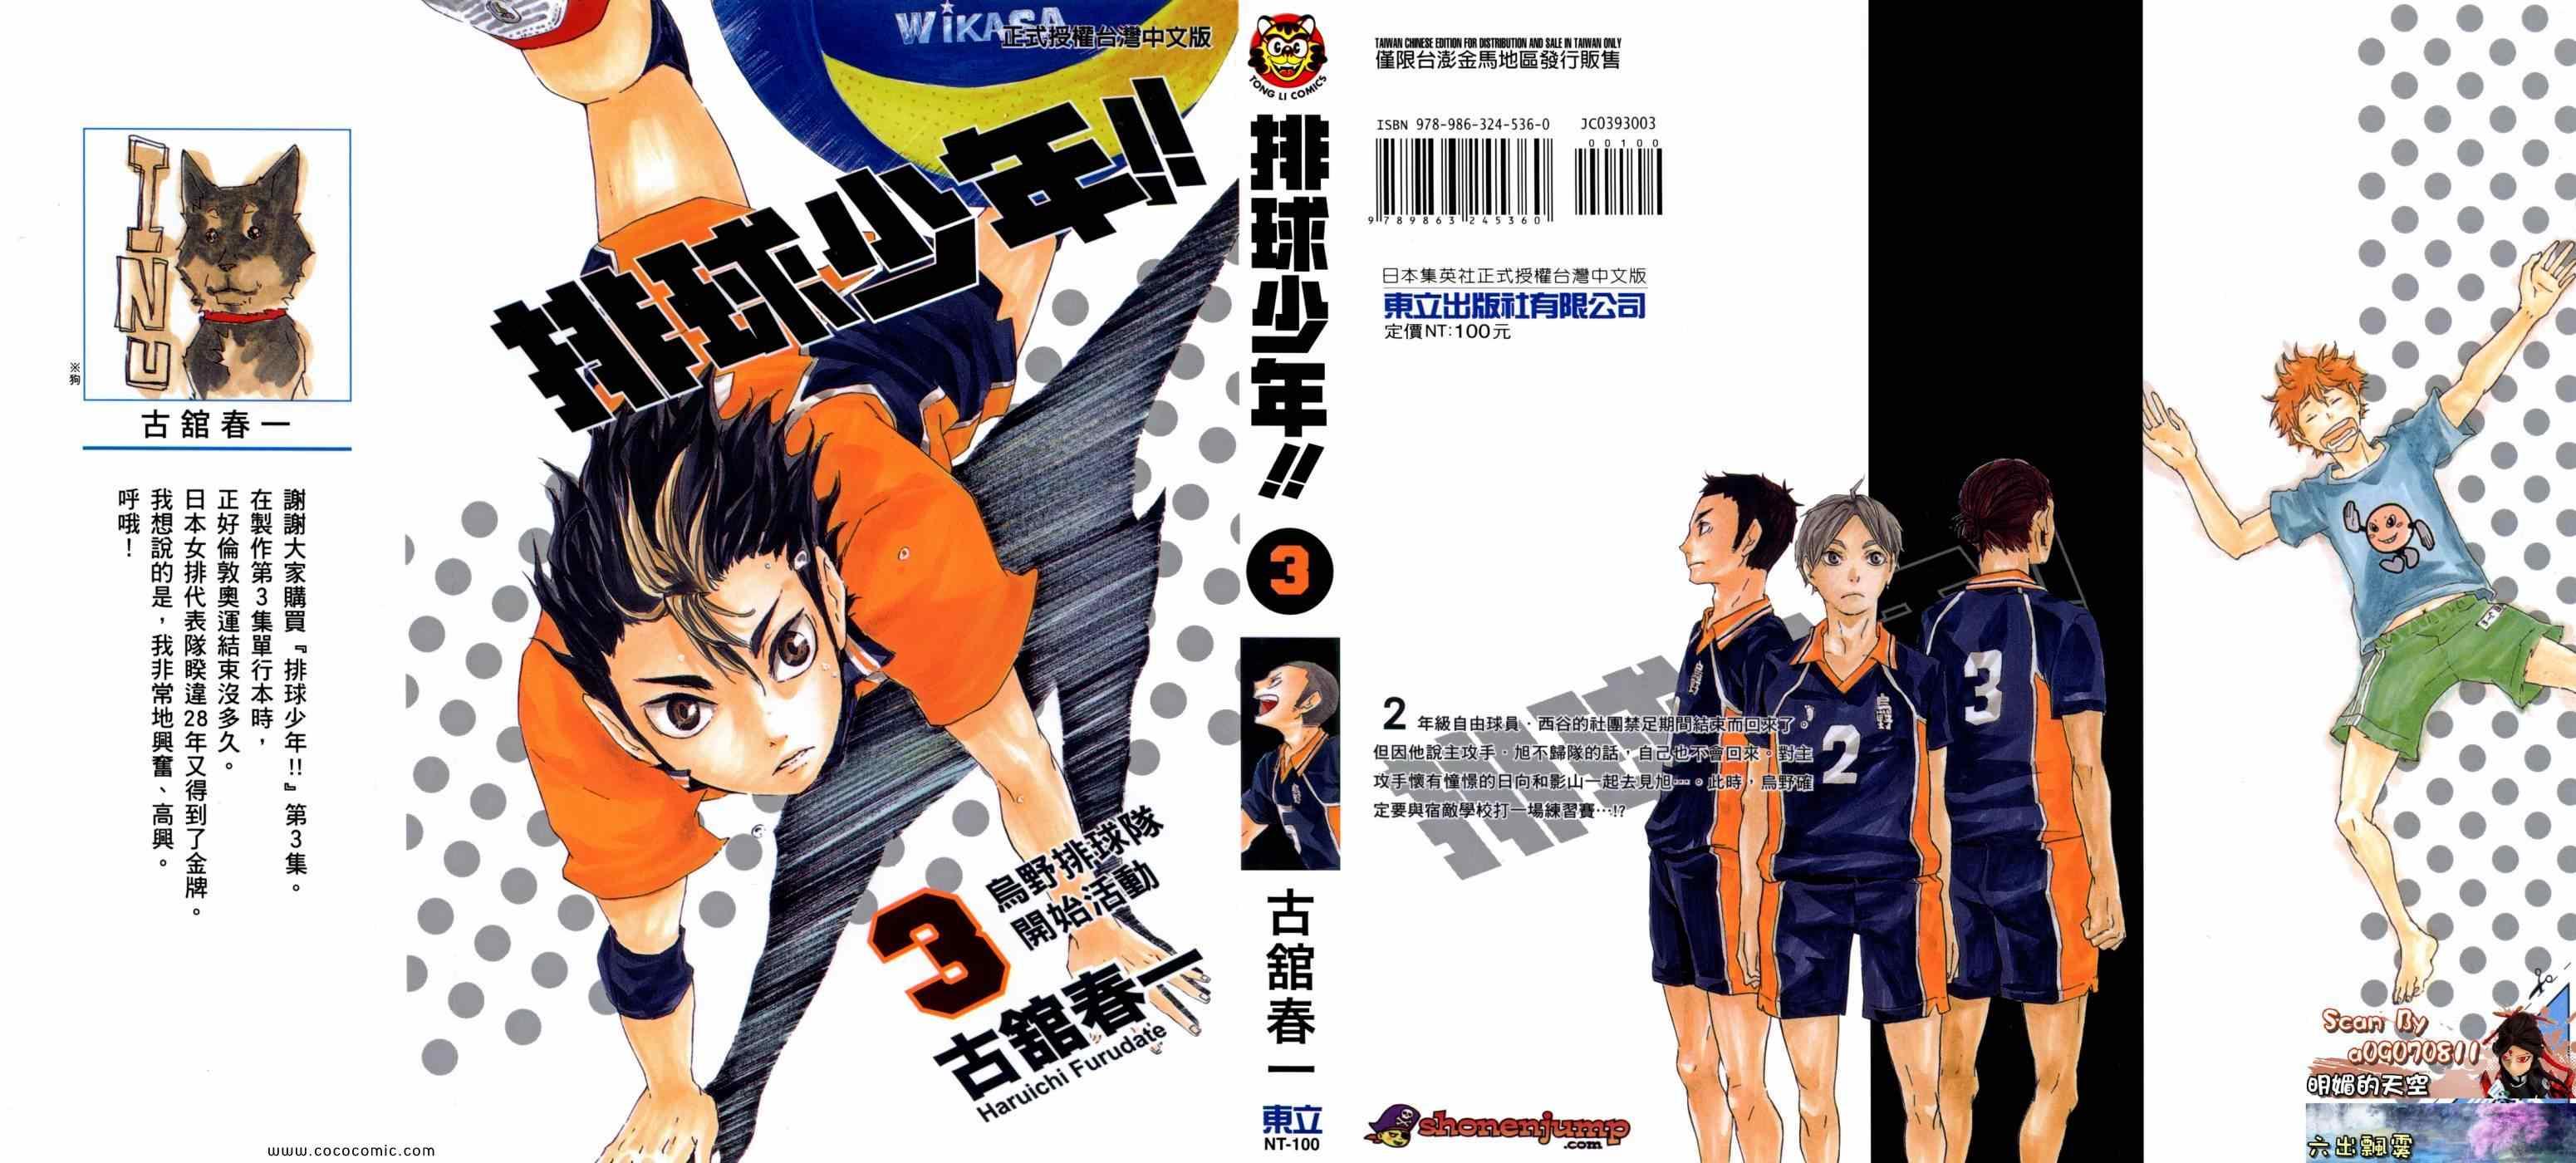 排球少年(ハイキュー!!)漫畫少年 03卷(第1頁)_排球少年少年 03卷劇情-看漫畫